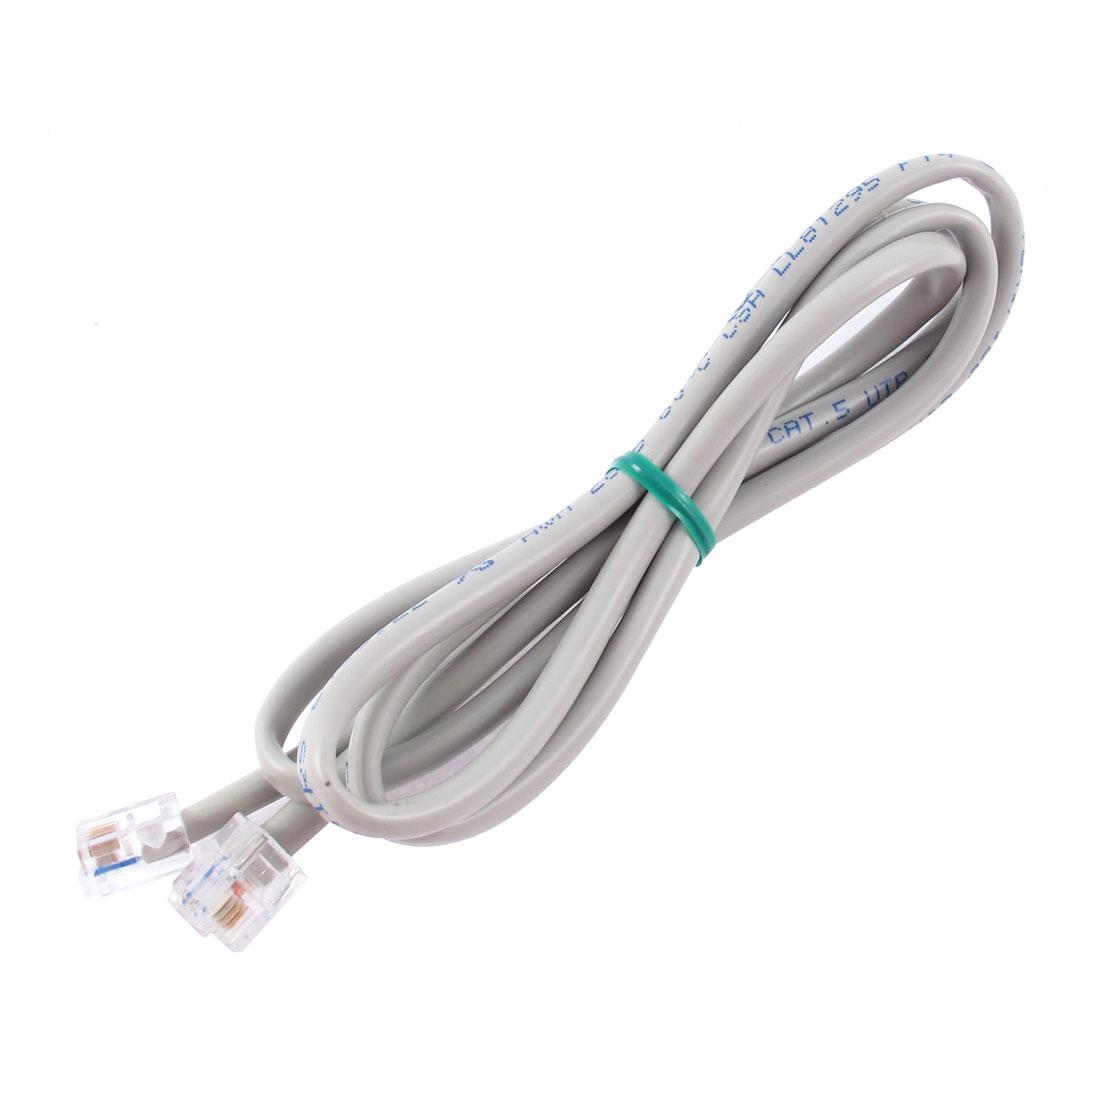 3.3Ft Length 6P4C RJ11 Telephone Extension Fax Modem Cable Line Gray